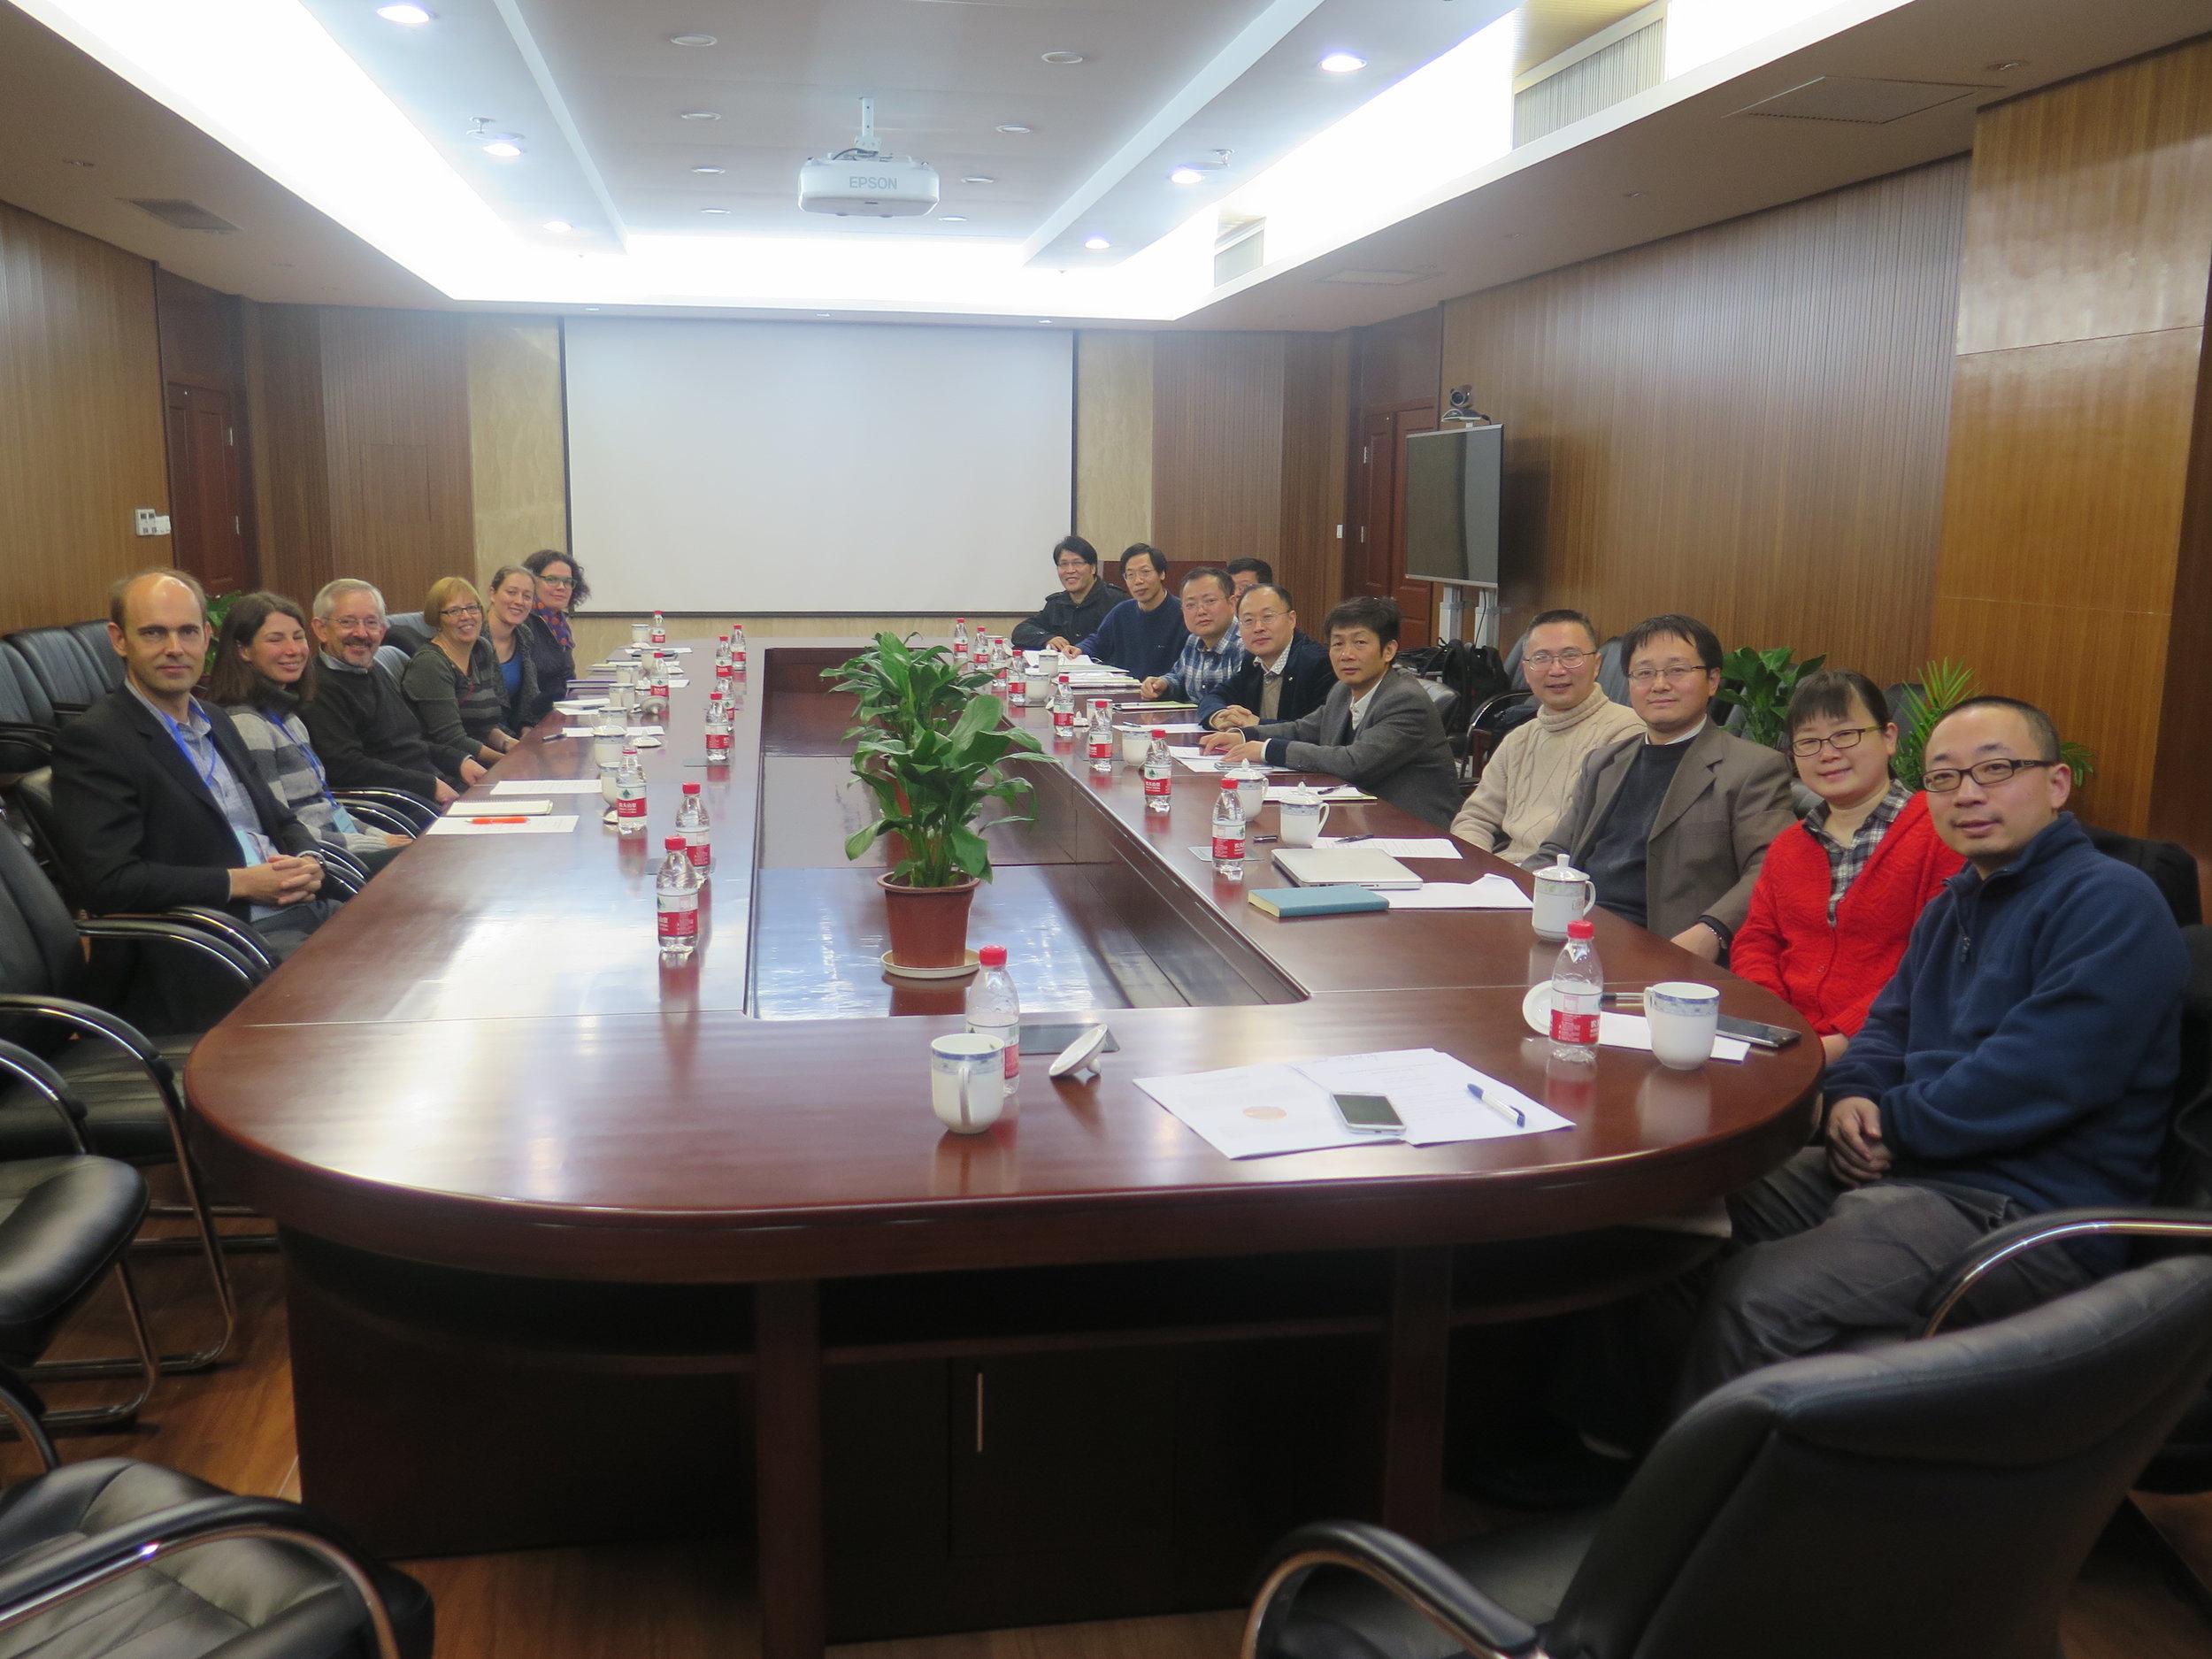 First Joint Nanjing University and Sydney University Colloquium,  Nanjing,China , Mar 2015